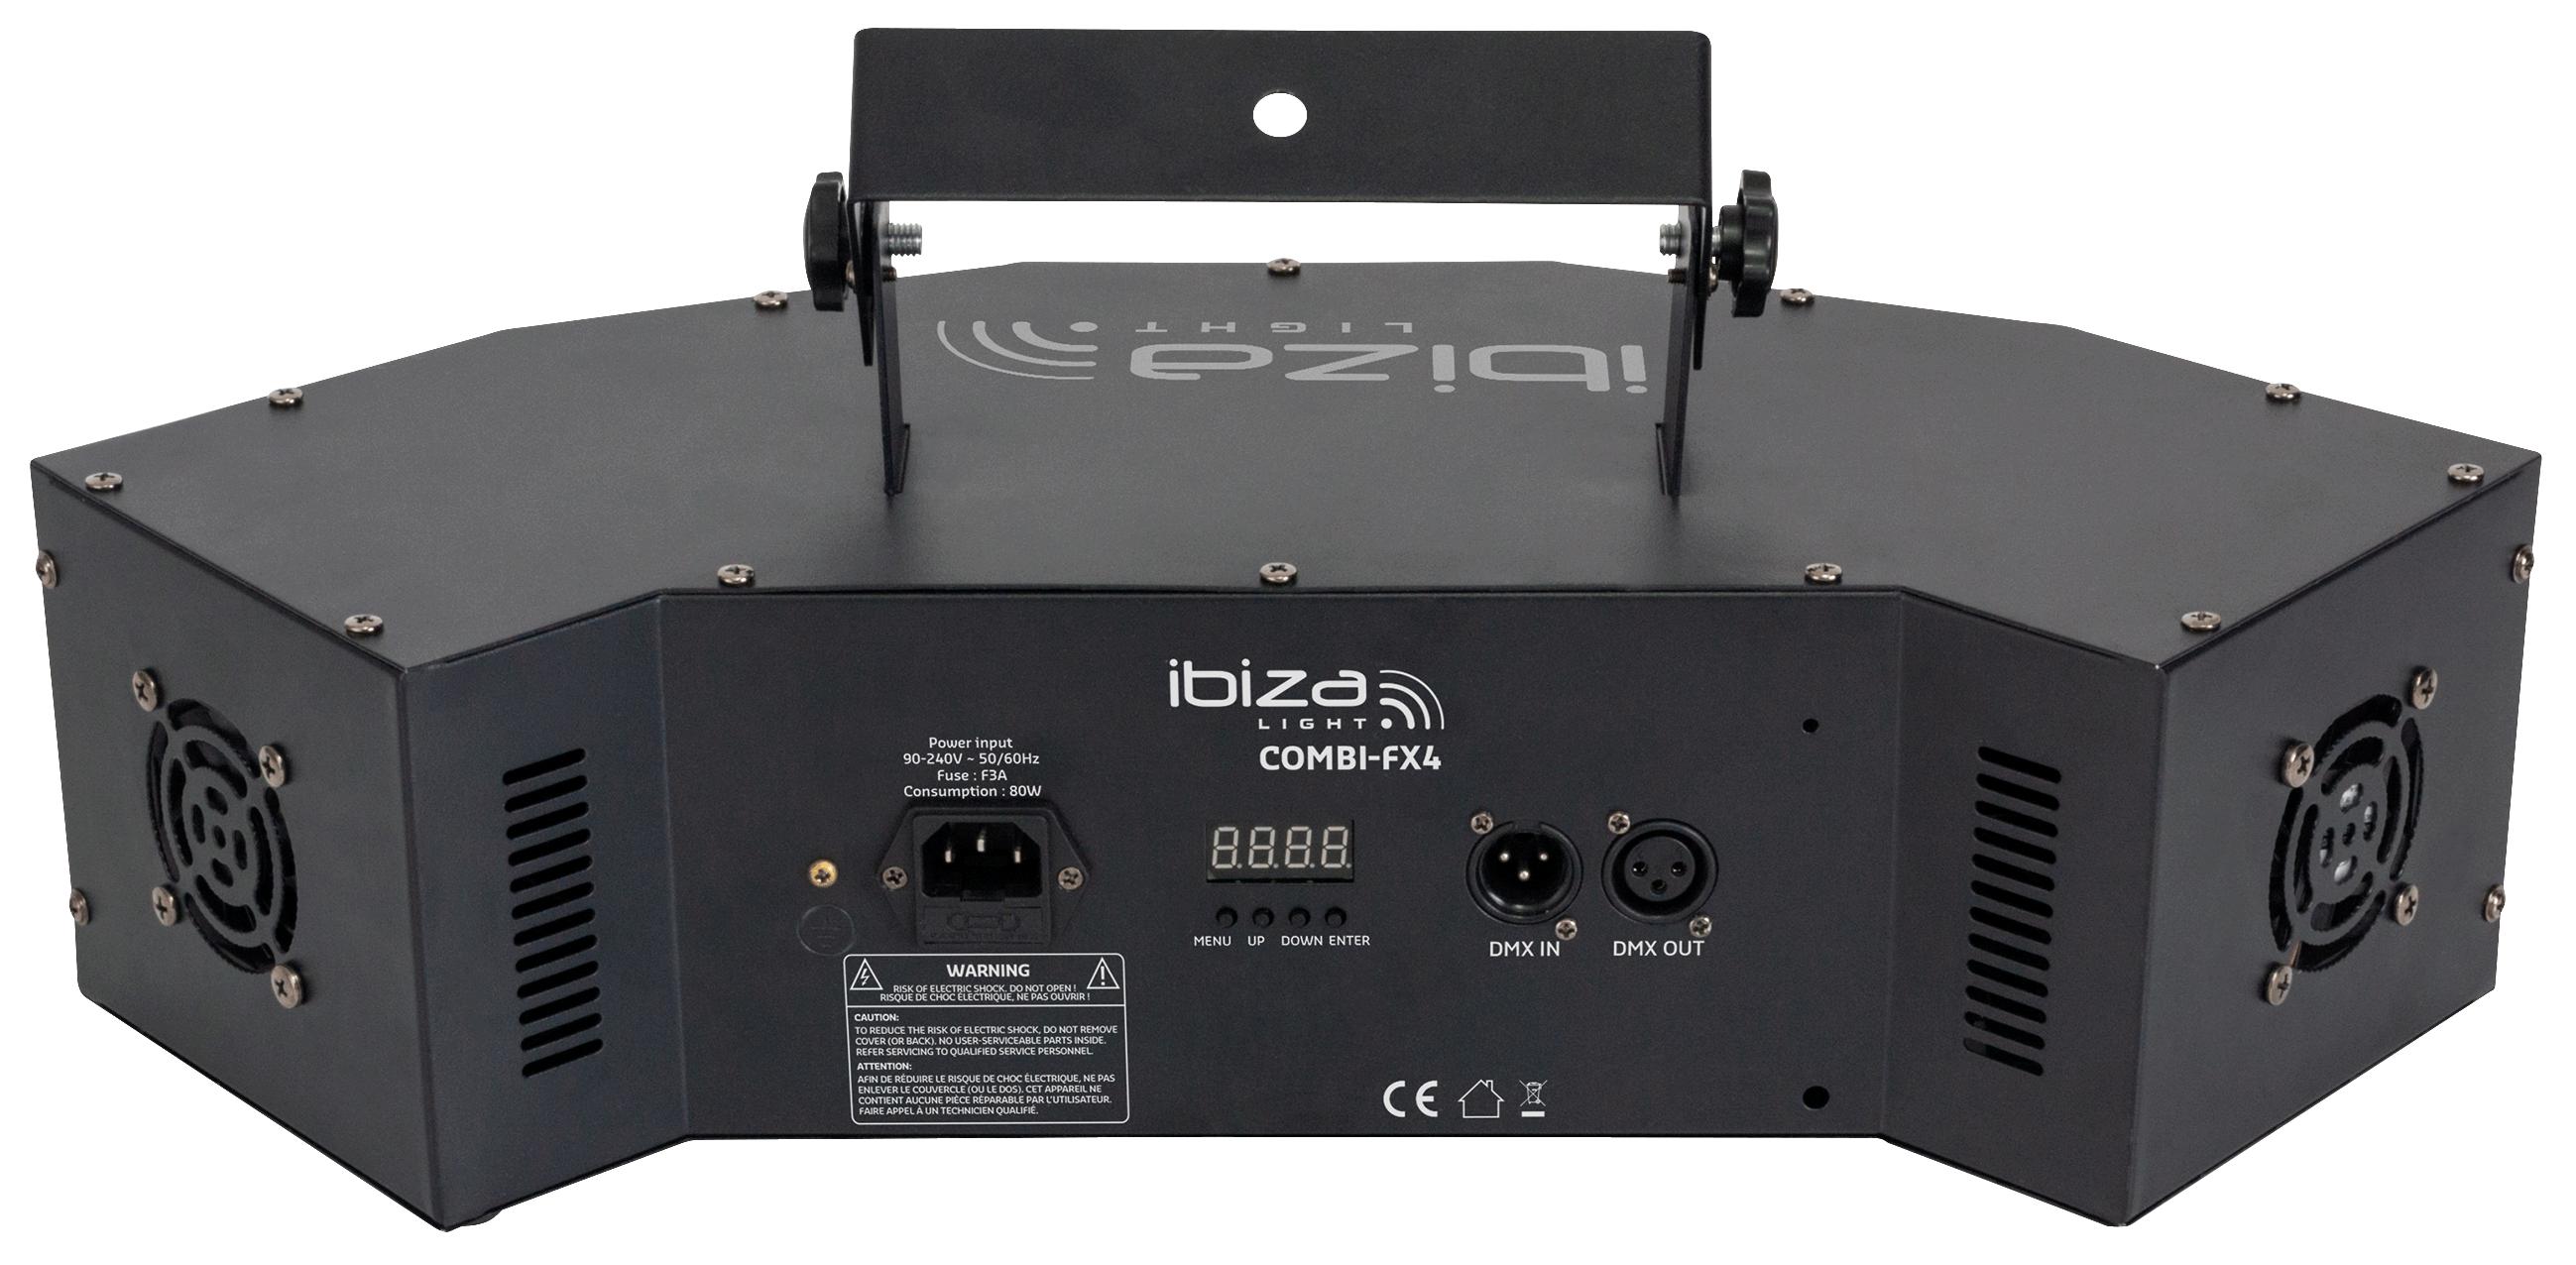 LED-Lichteffekt IBIZA ''COMBI-FX4'' DMX gesteuert, 3in1 Wash-Moon-Strobe